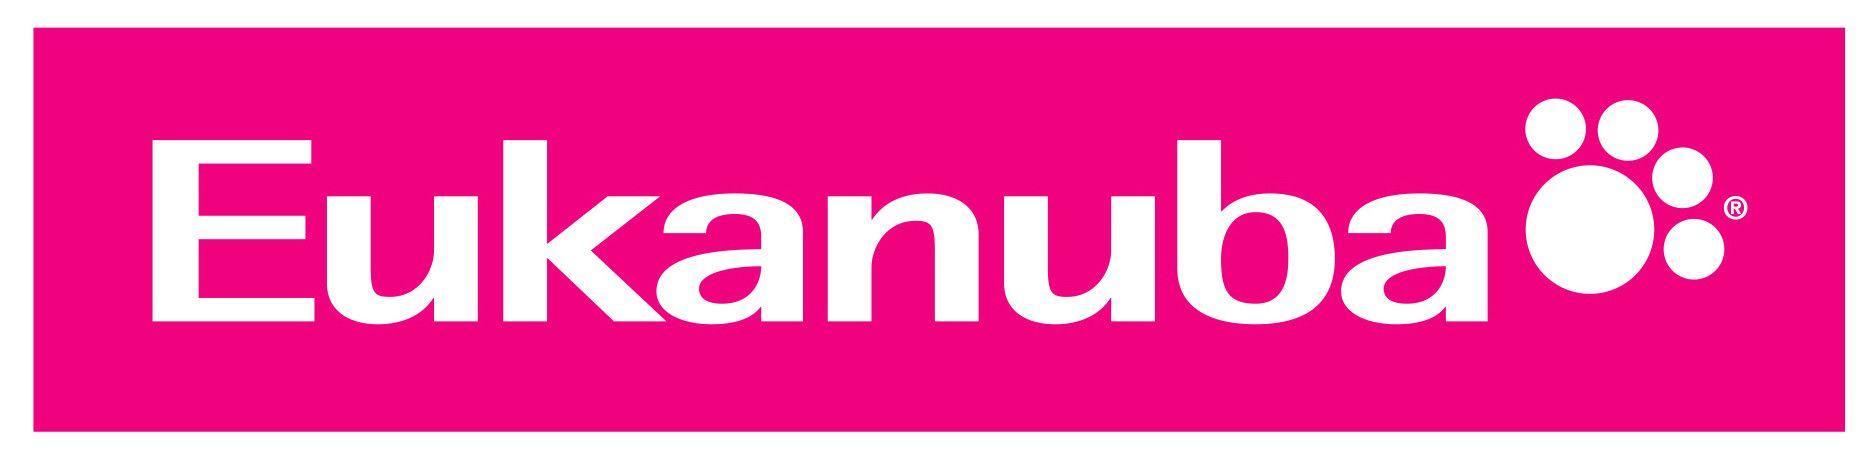 Eukanuba Logo - eukanuba logo :: Russell Feed & Supply